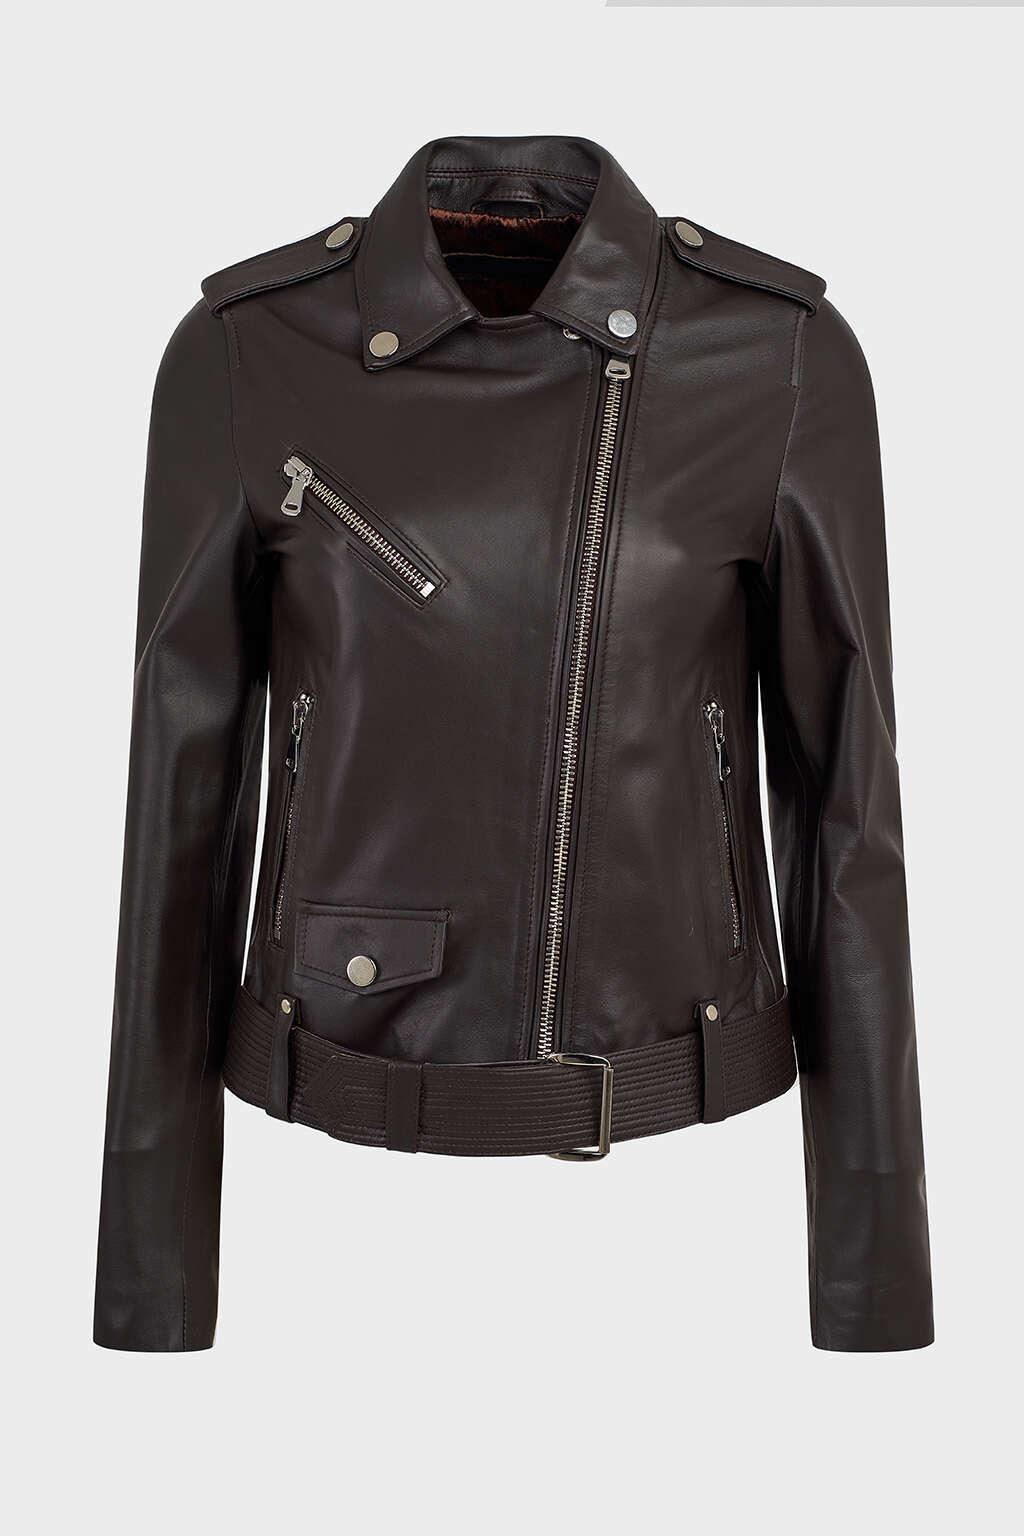 Front of Matte Black Leather Biker Jacket with Buckle